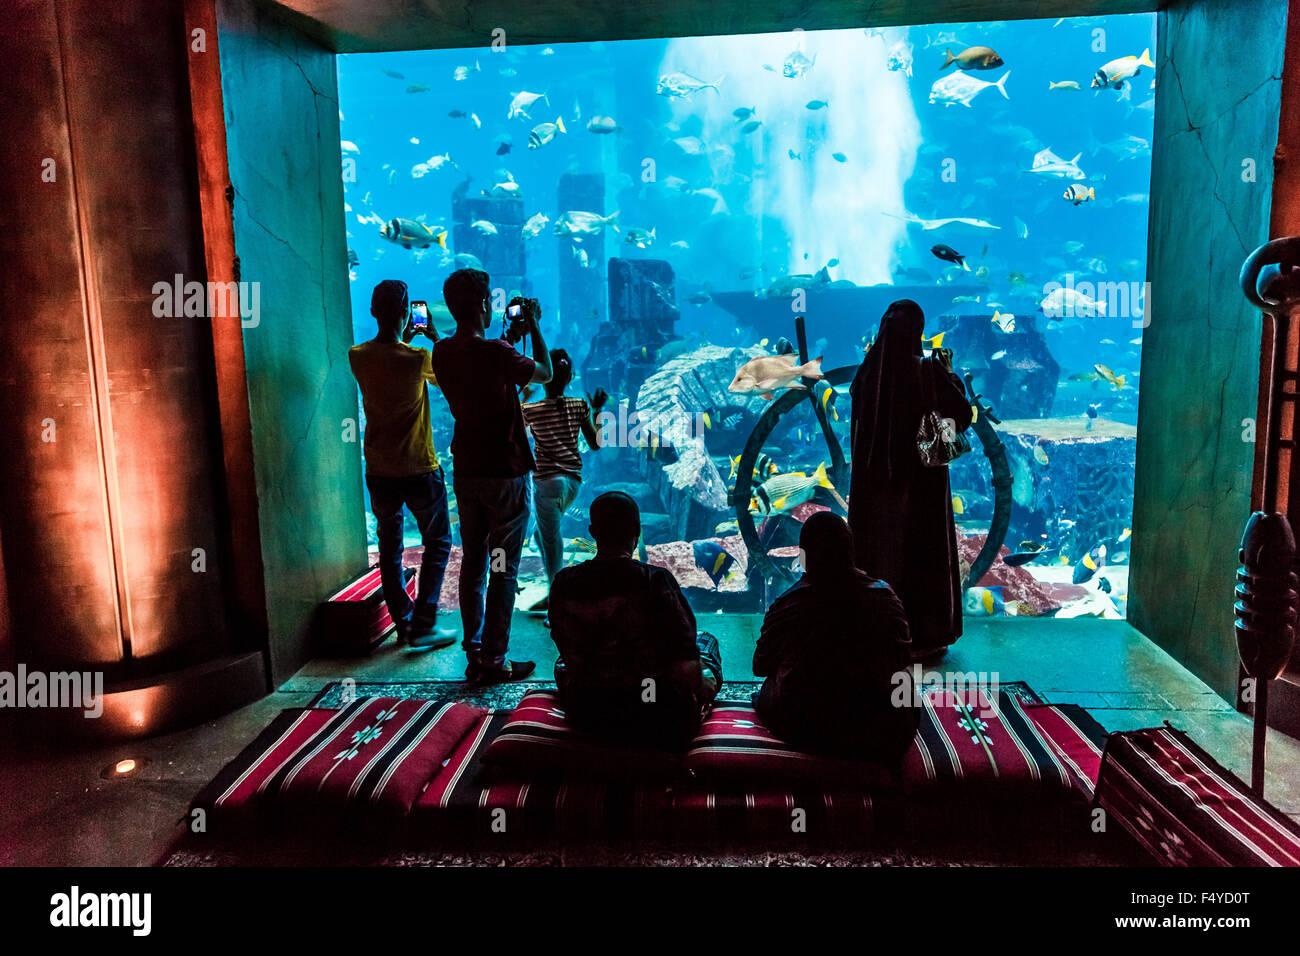 Underwater Hotel Stock Photos & Underwater Hotel Stock